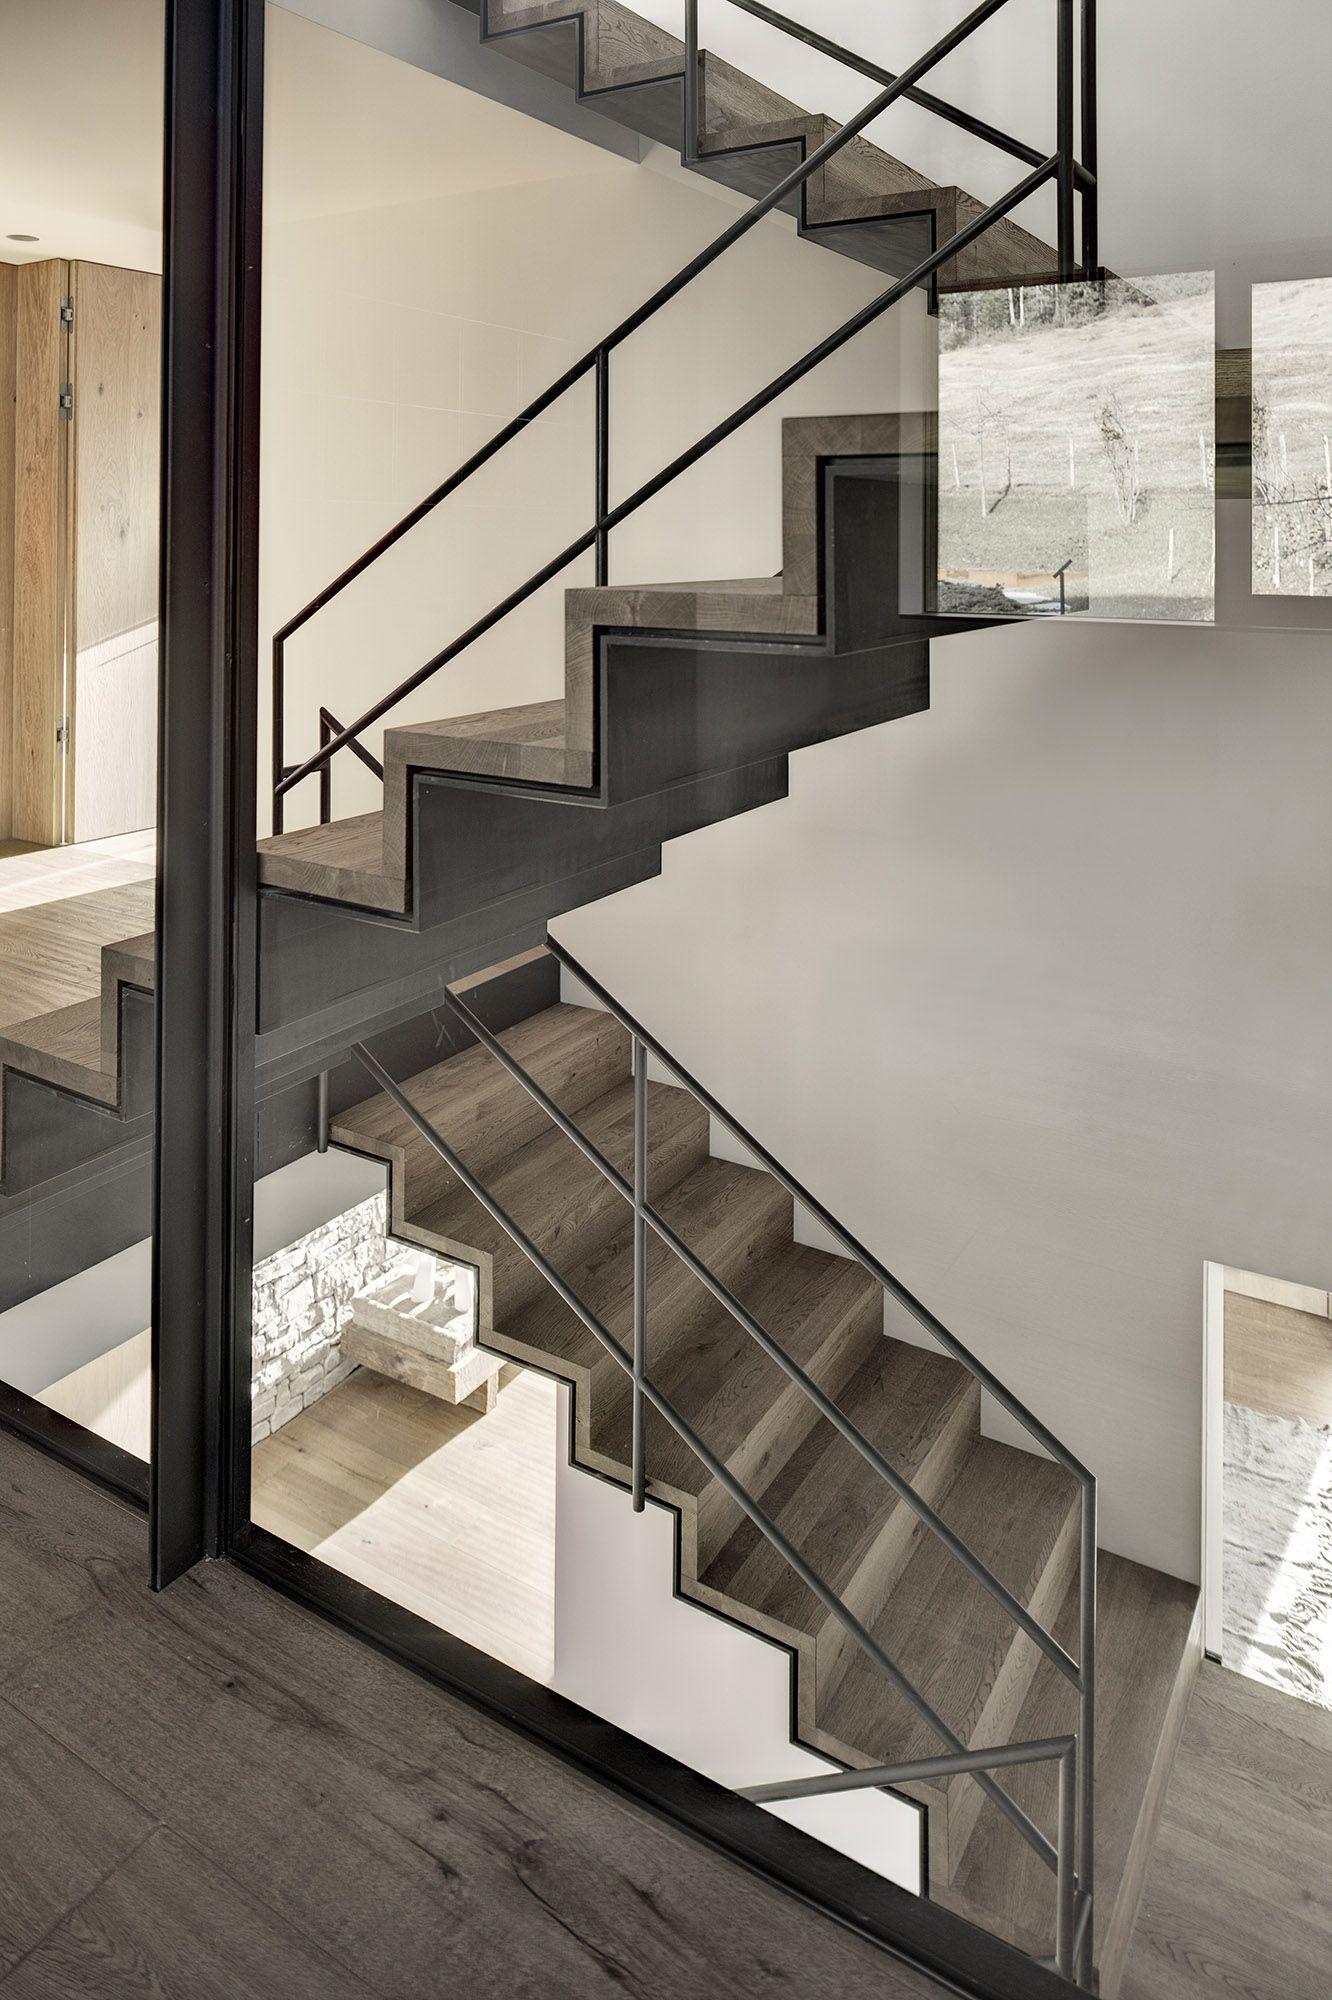 Haus Wiesenhof By Gogl Architekten Metal Stairstimber Staircasefloating